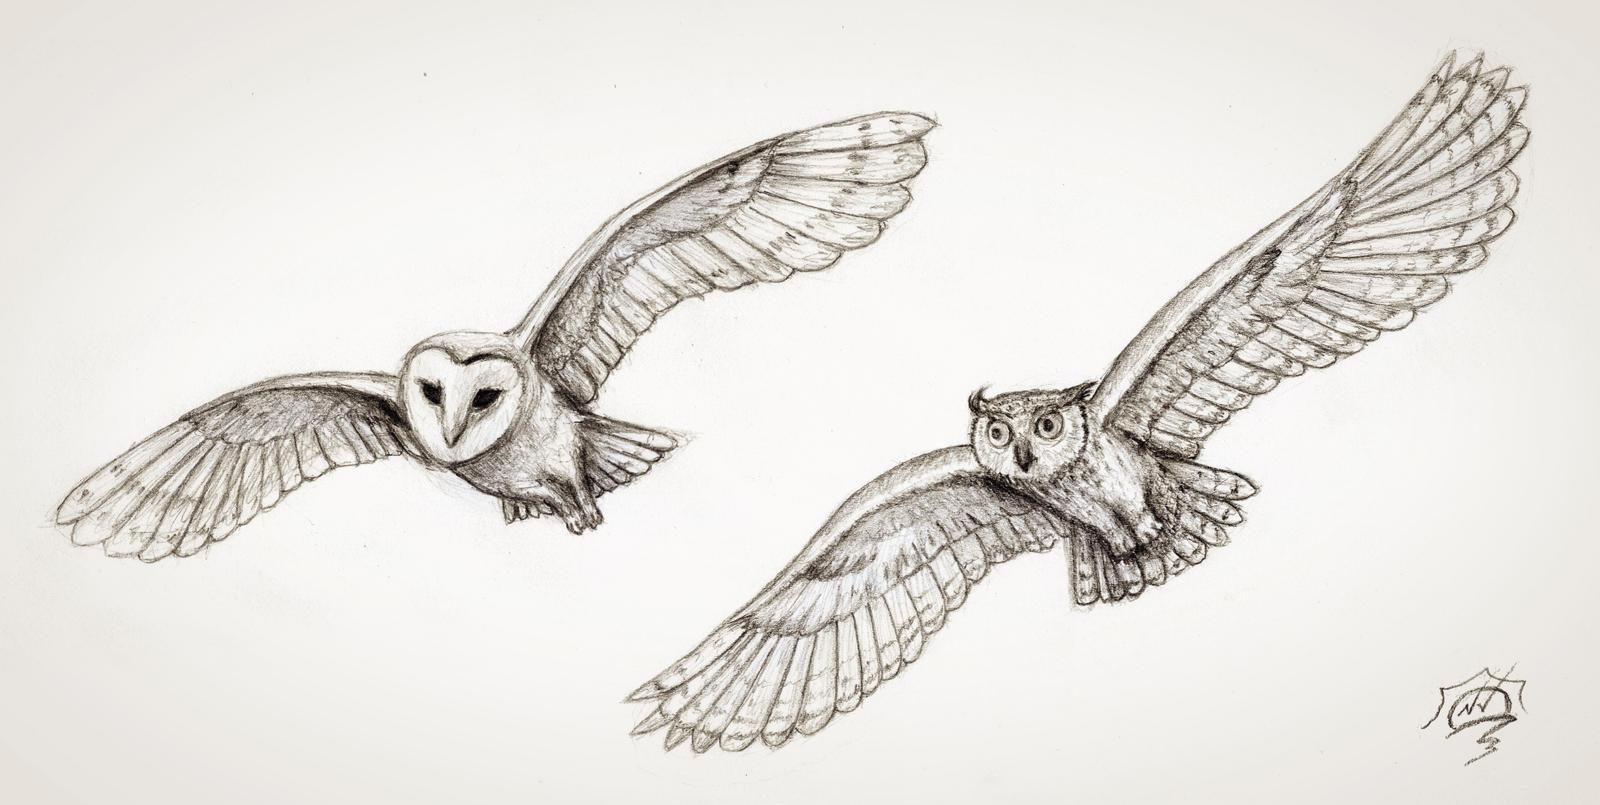 2 flying owls by Snoeffel on DeviantArt